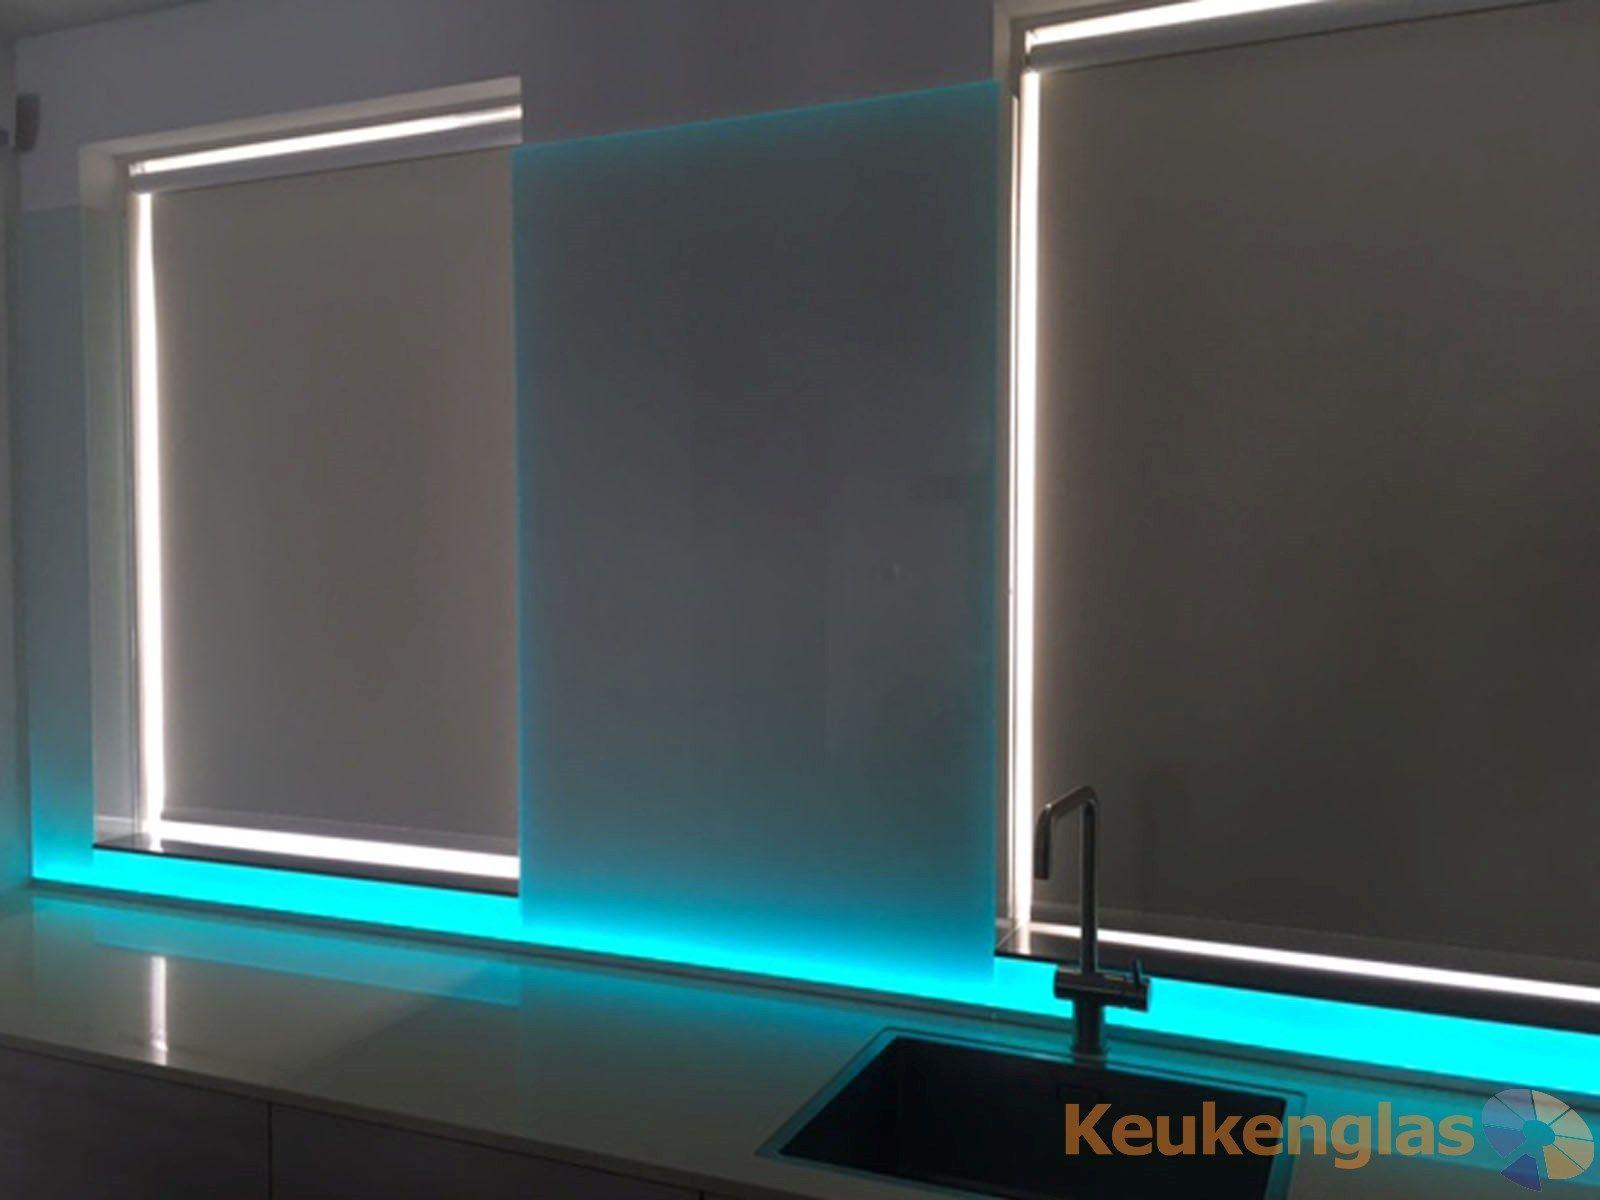 Led Strip Keuken : Keuken onderkast verlichting elegant led strip onder keukenkast